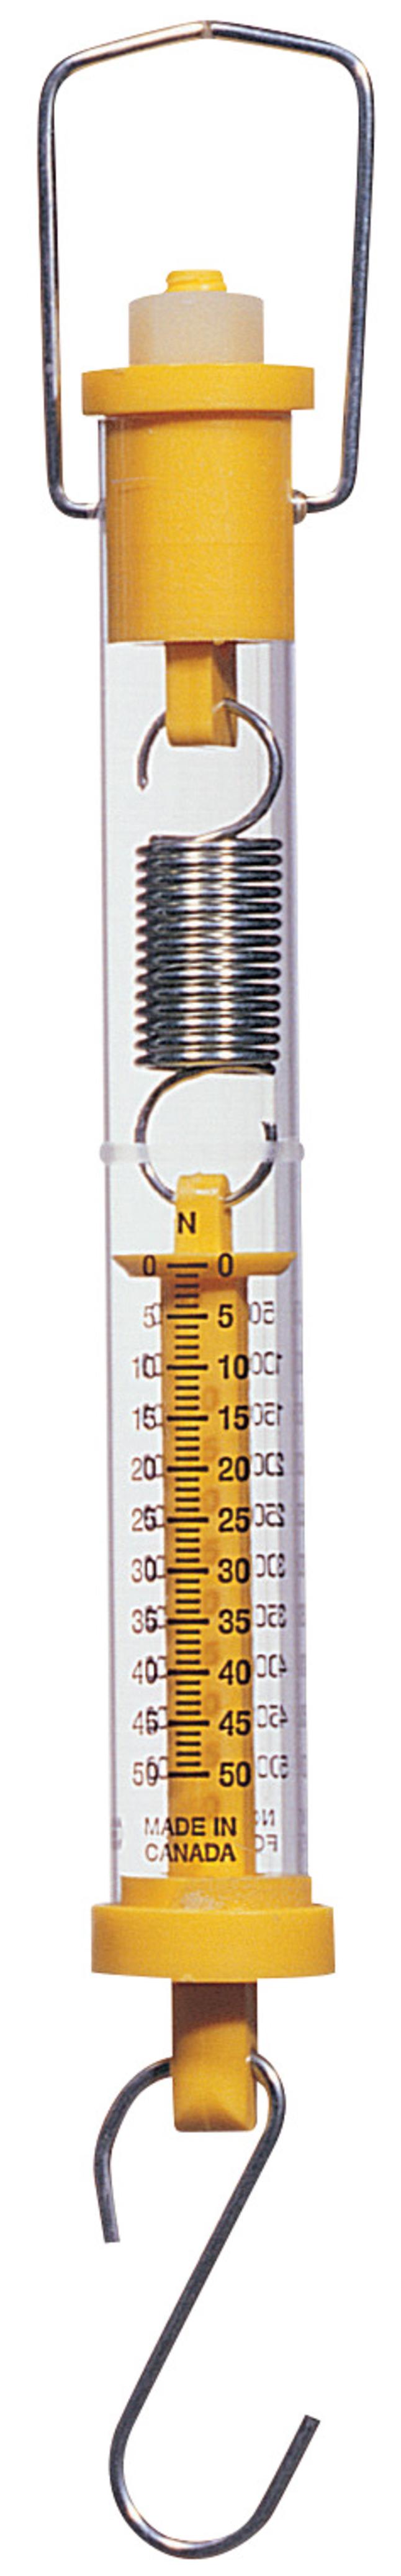 Measuring Tools, Scales, Balances Supplies, Item Number 190-7421